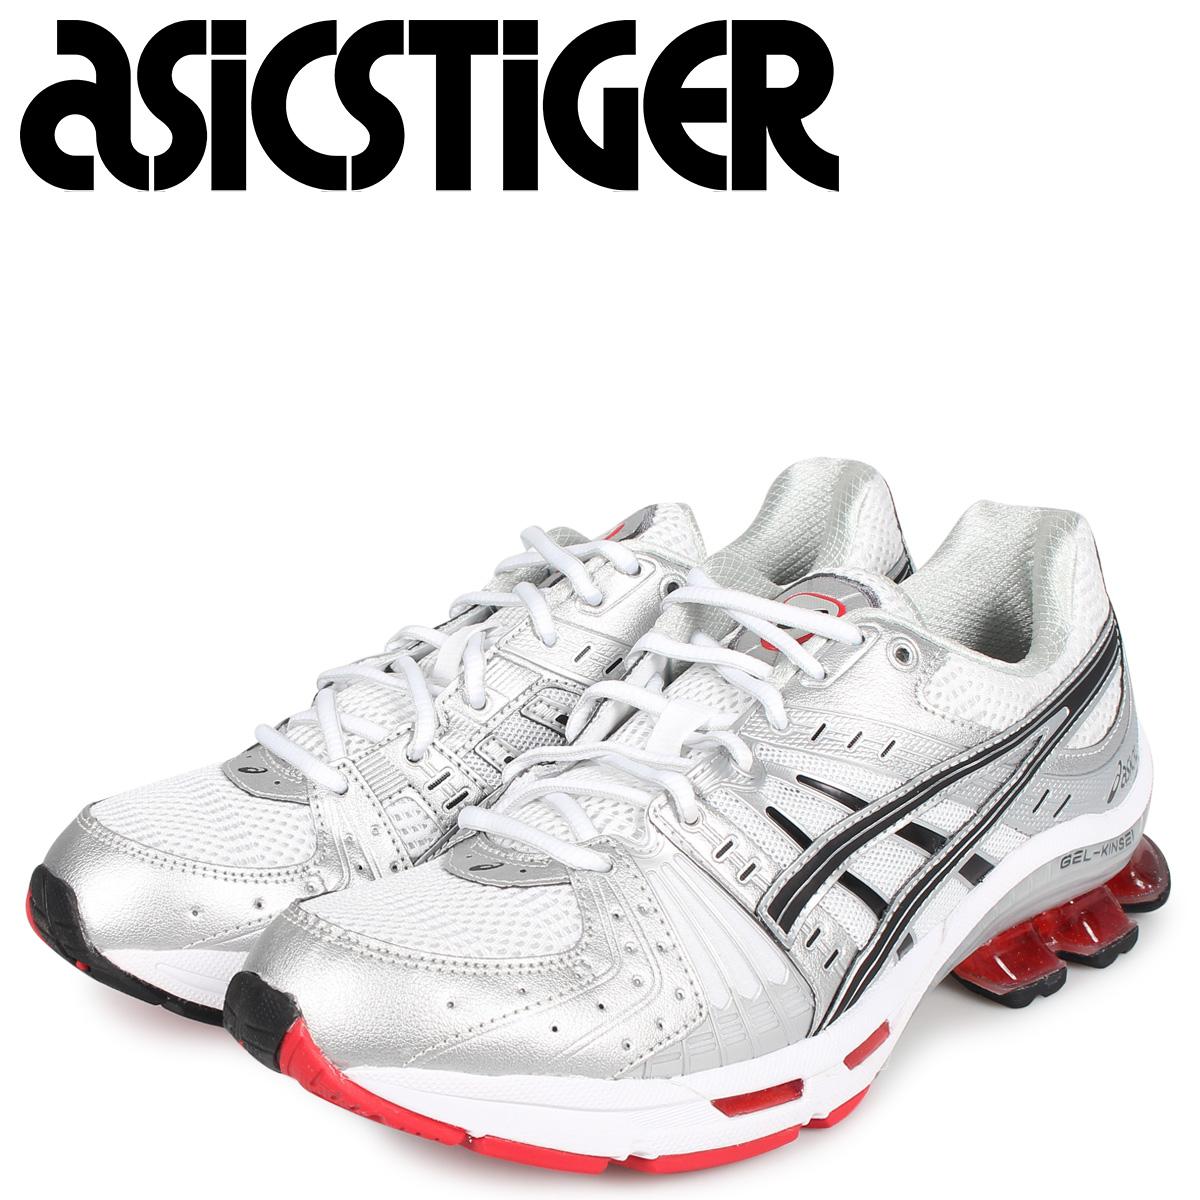 asics Tiger アシックスタイガー ゲル キンセイ スニーカー メンズ GEL-KINSEI OG ホワイト 白 1021A117-101